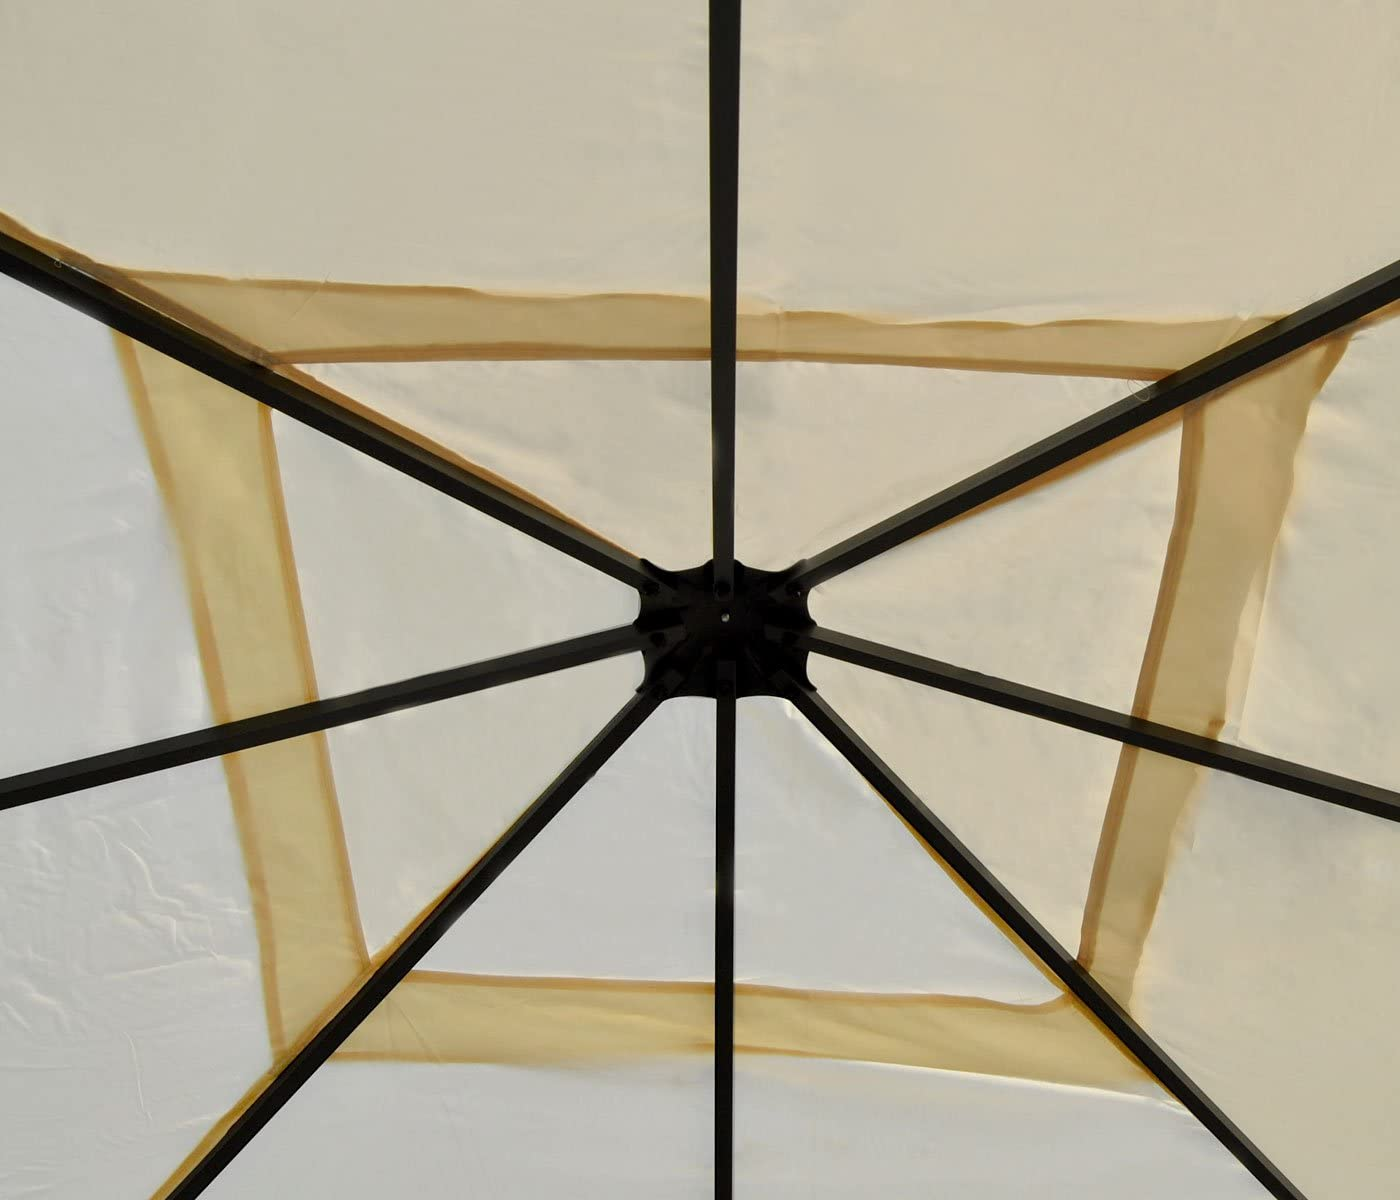 Pergola Cadiz, Cenador prikker-überdachungen, estructura estable ...